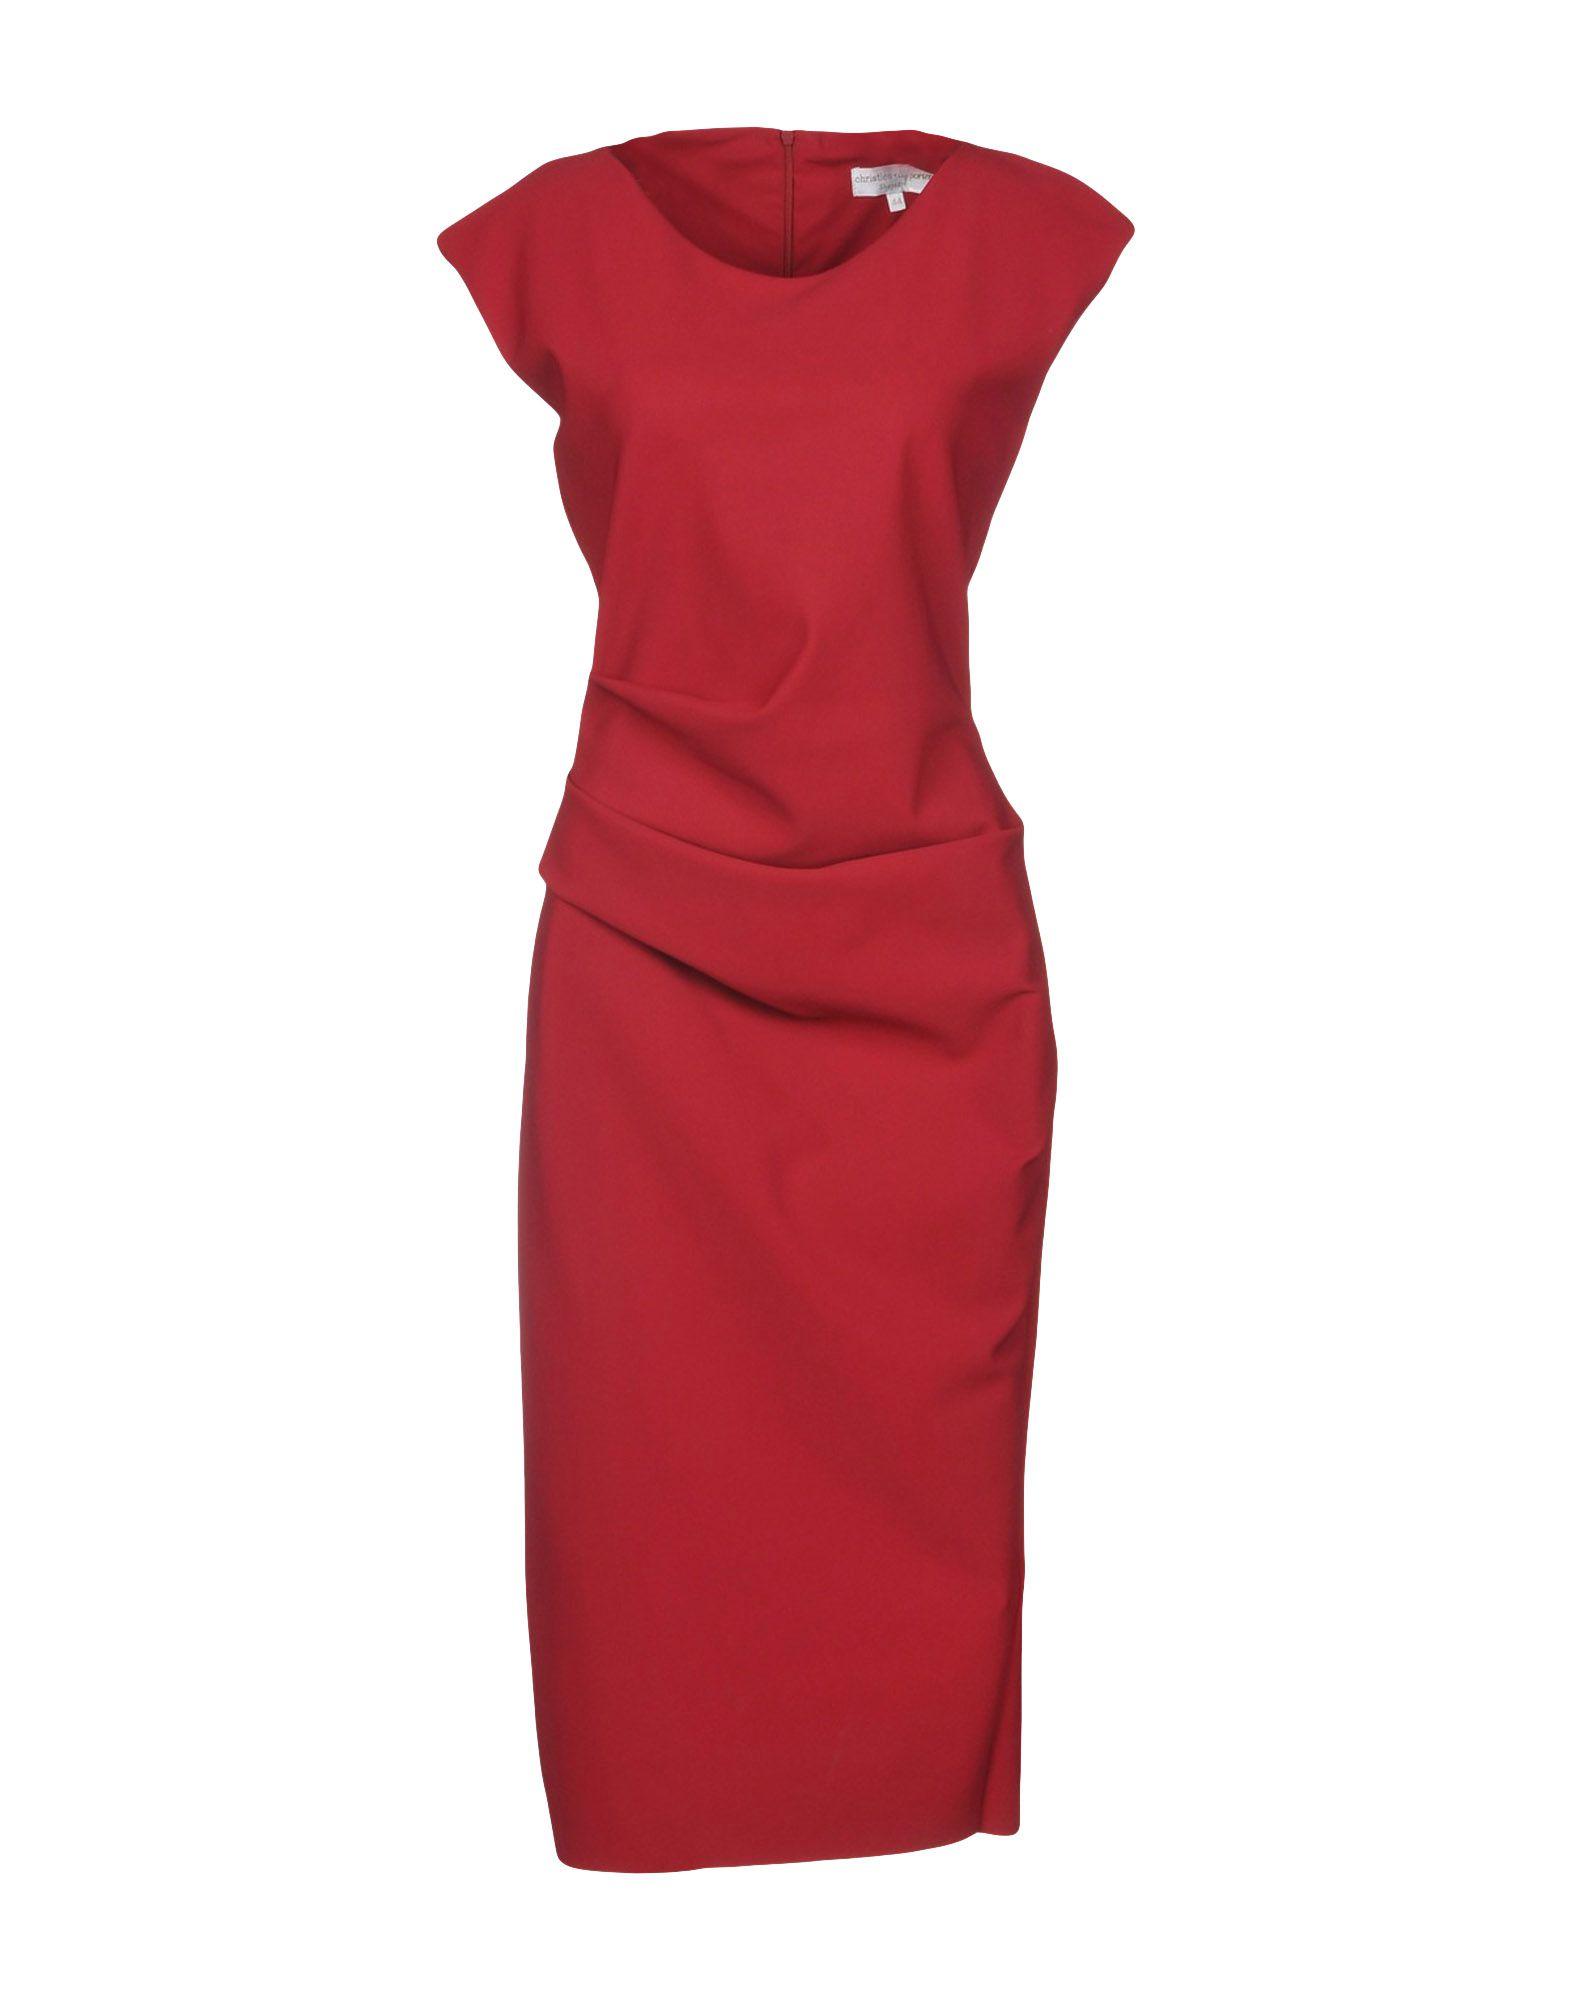 Фото CHRISTIES À PORTER Платье длиной 3/4 часы nixon porter nylon gold white red